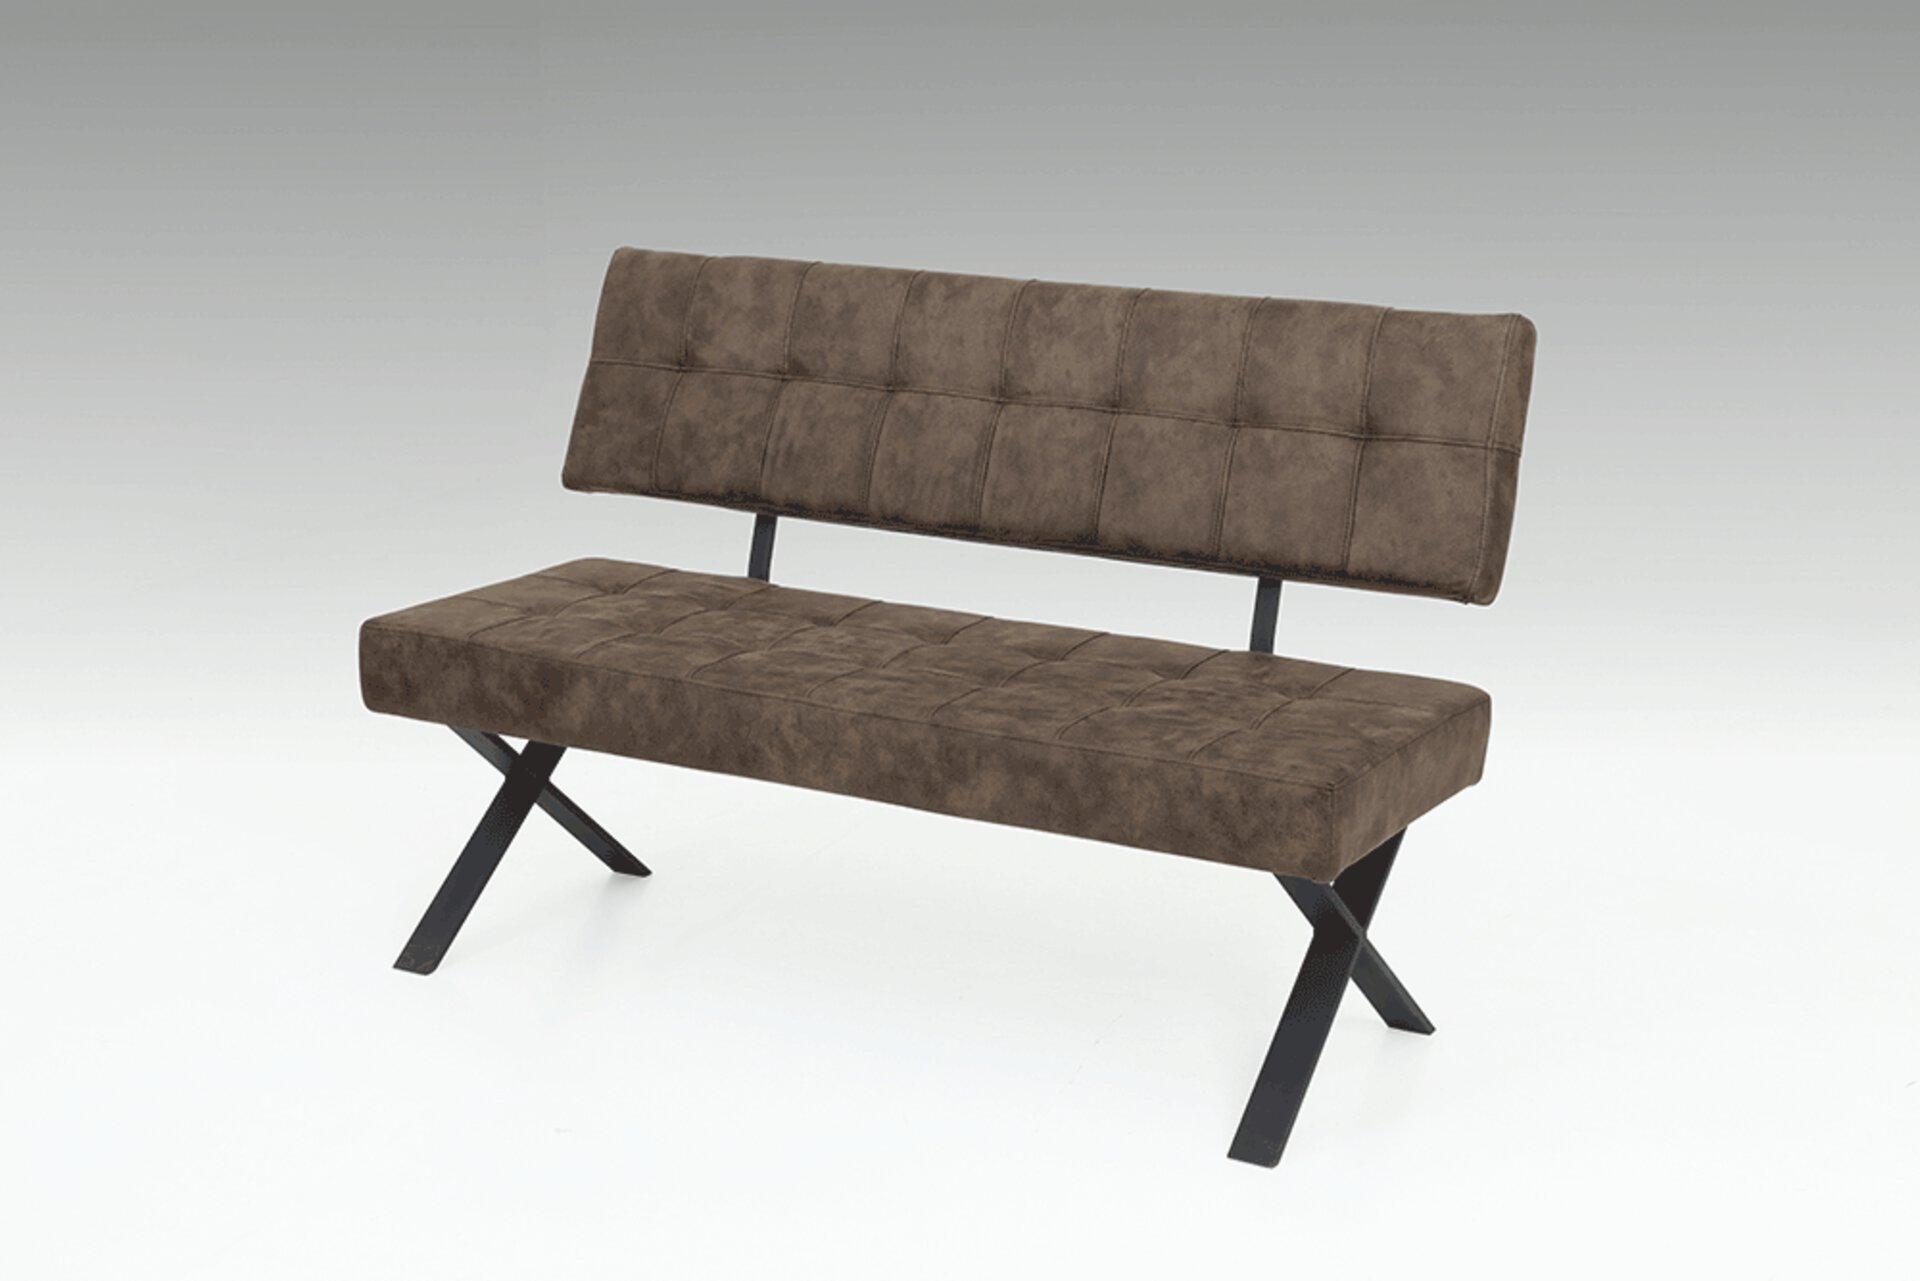 Sitzbank DONNA Dinett Textil mehrfarbig 61 x 93 x 140 cm